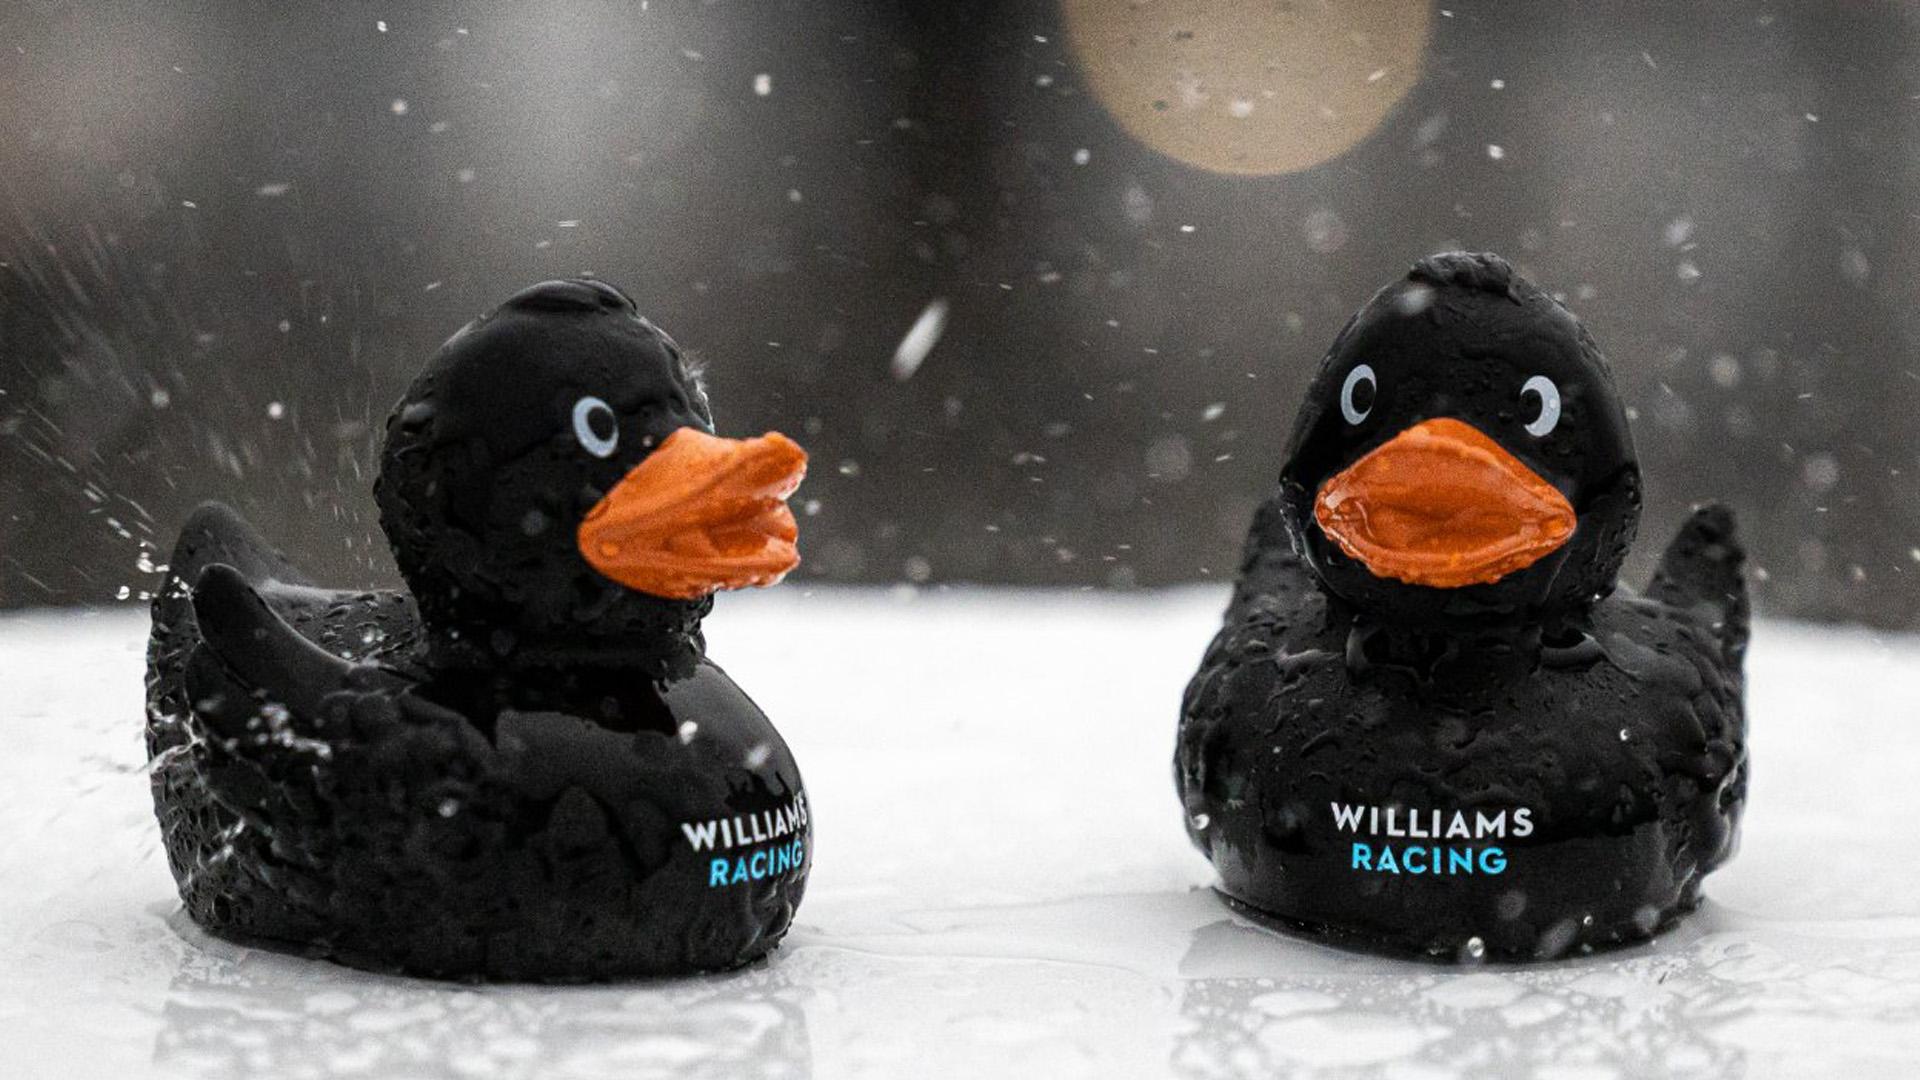 Williams-branded rubber bath toy ducks in the rain